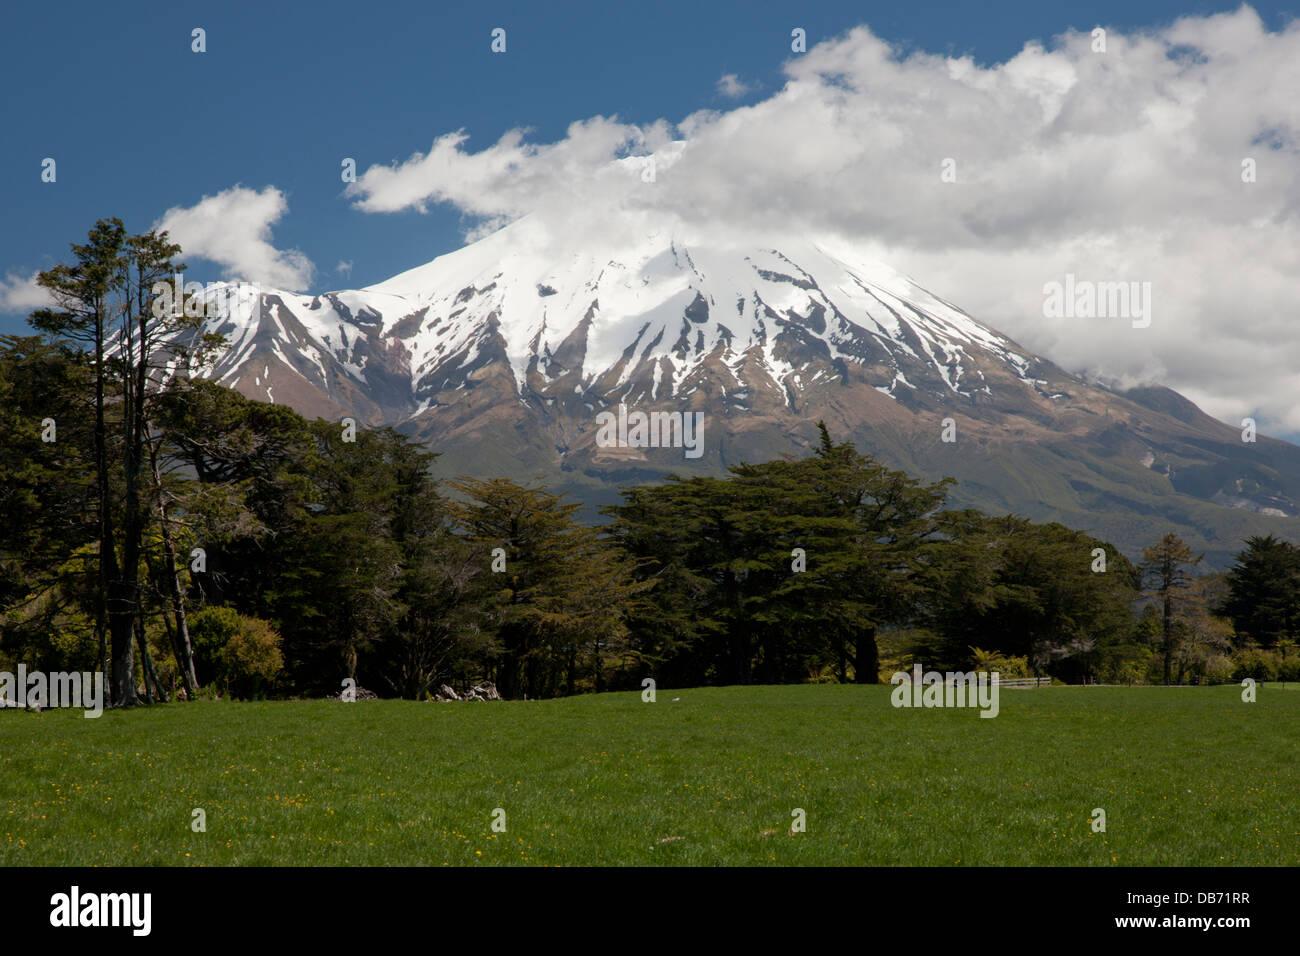 South Pacific, New Zealand, North Island. View of volcanic mountain Mt. Taranaki. - Stock Image